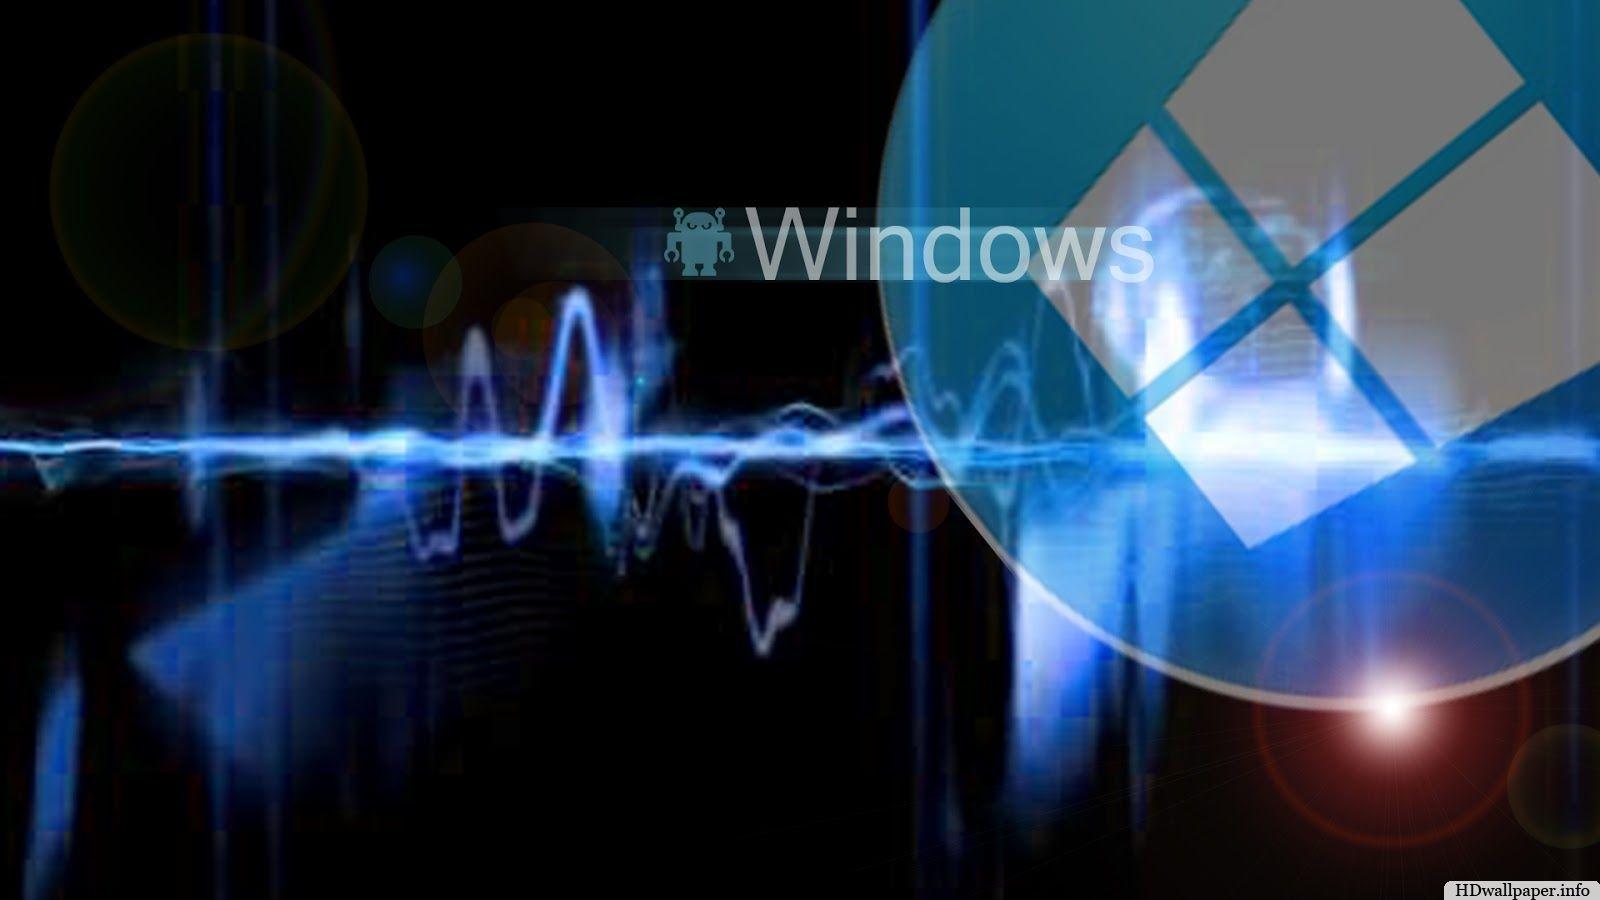 Wallpaper download for windows 10 - Windows 10 Wallpaper Download Hd Http Hdwallpaper Info Windows